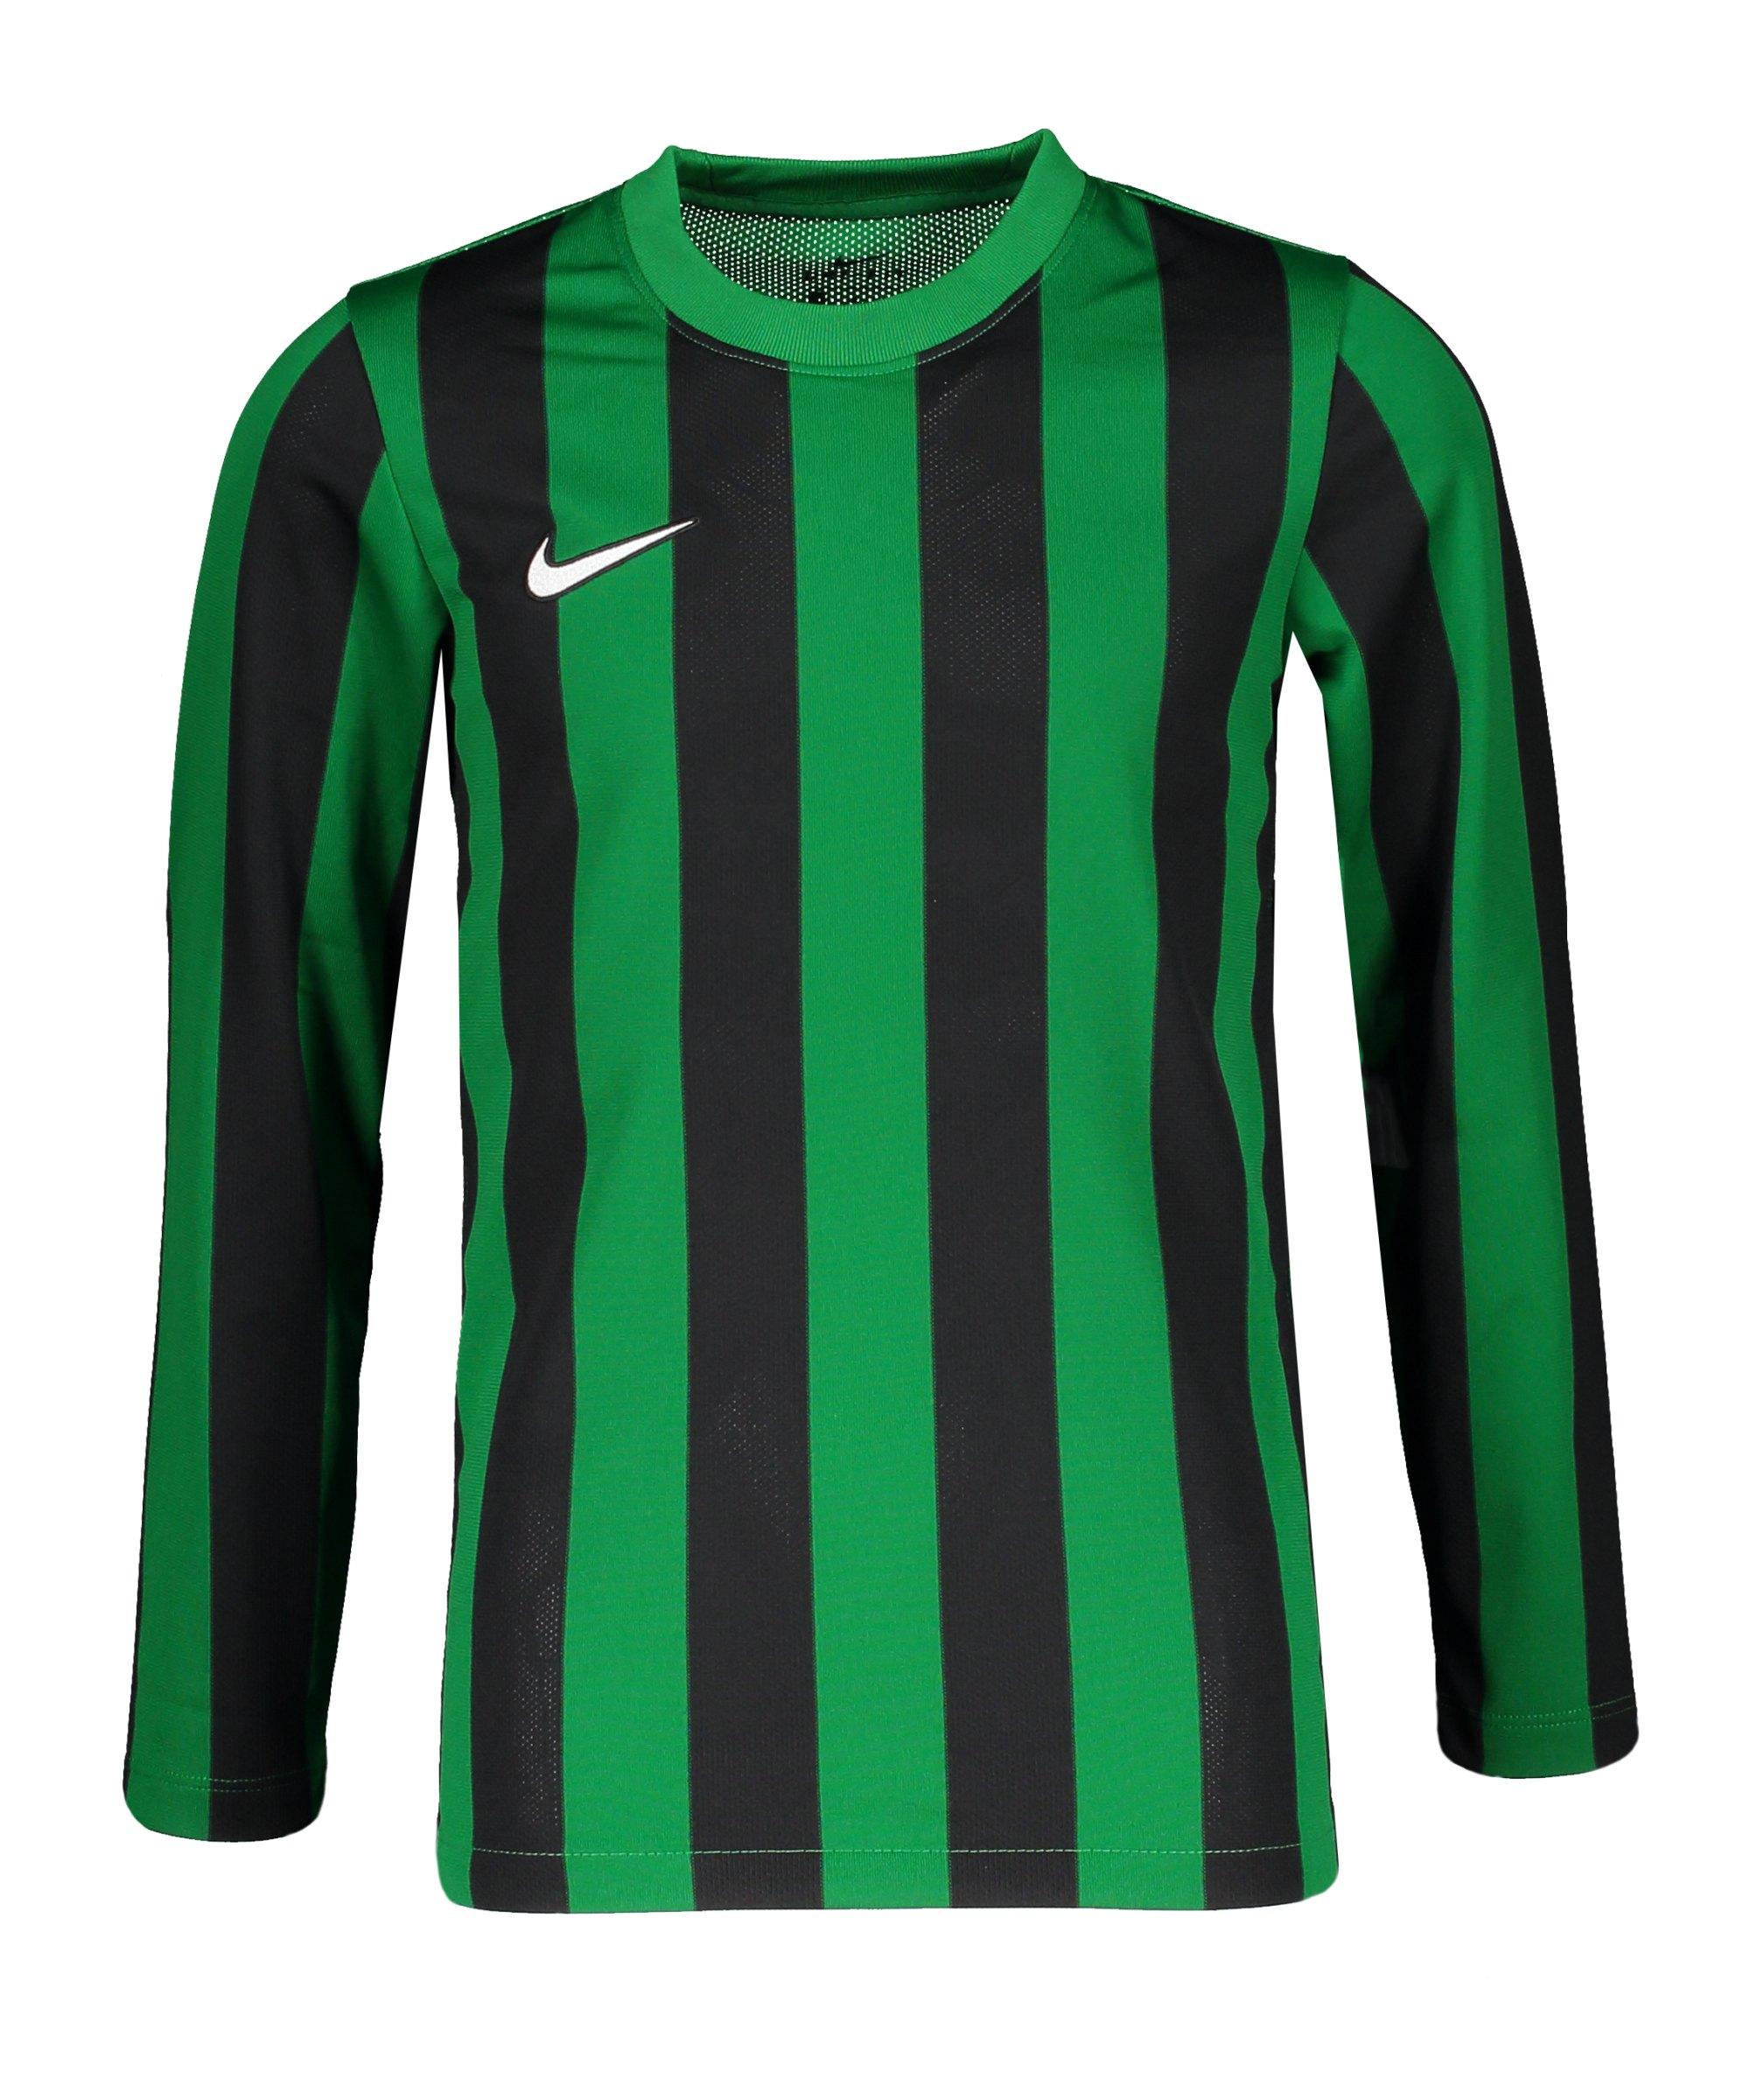 Nike Division IV Striped Trikot langarm Kids F302 - gruen